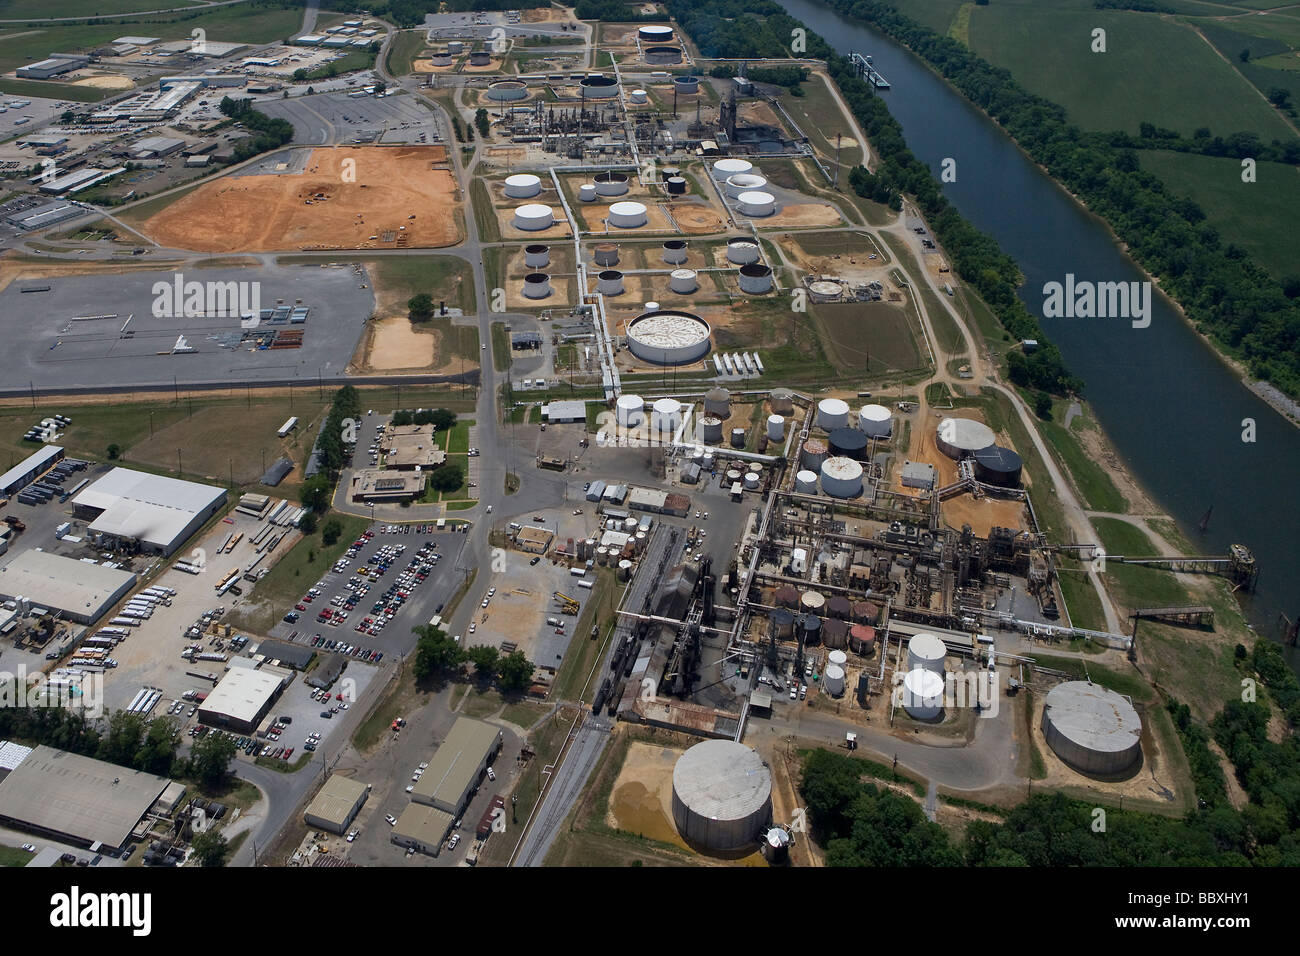 aerial view above Hunt Refining Company, Tuscaloosa, Alabama adjacent to Black Warrior river - Stock Image